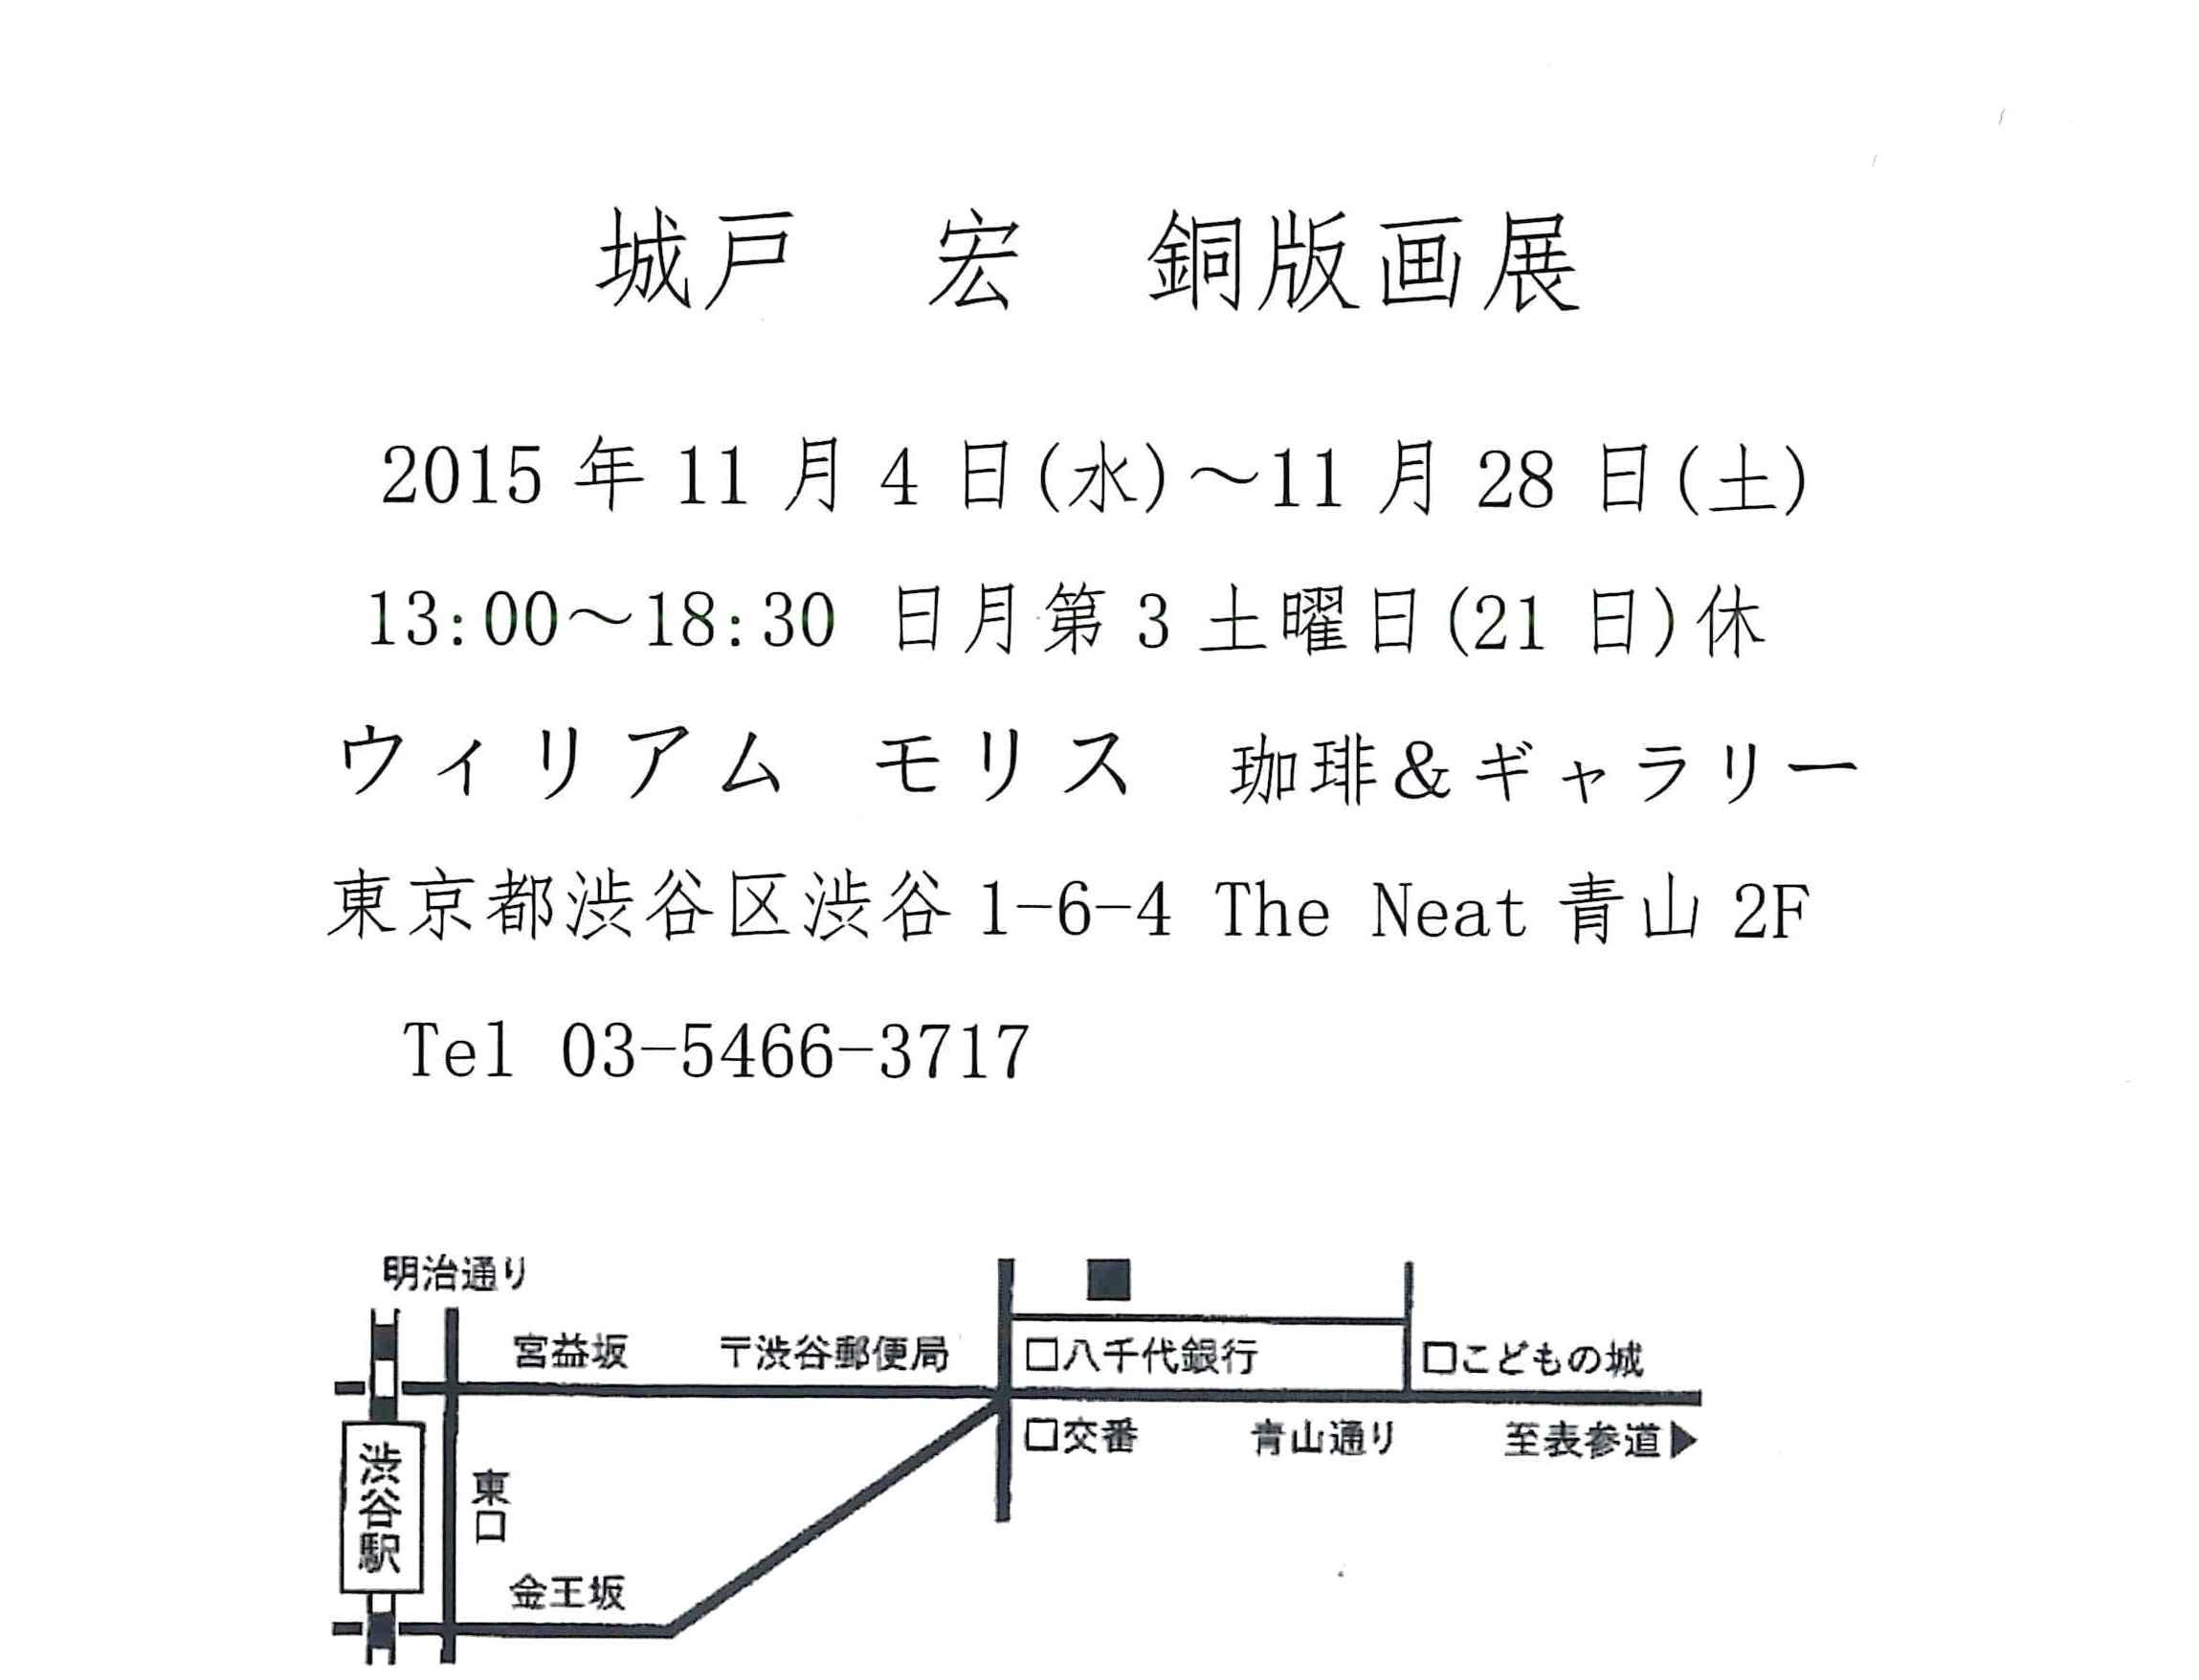 20151026180358361_0003